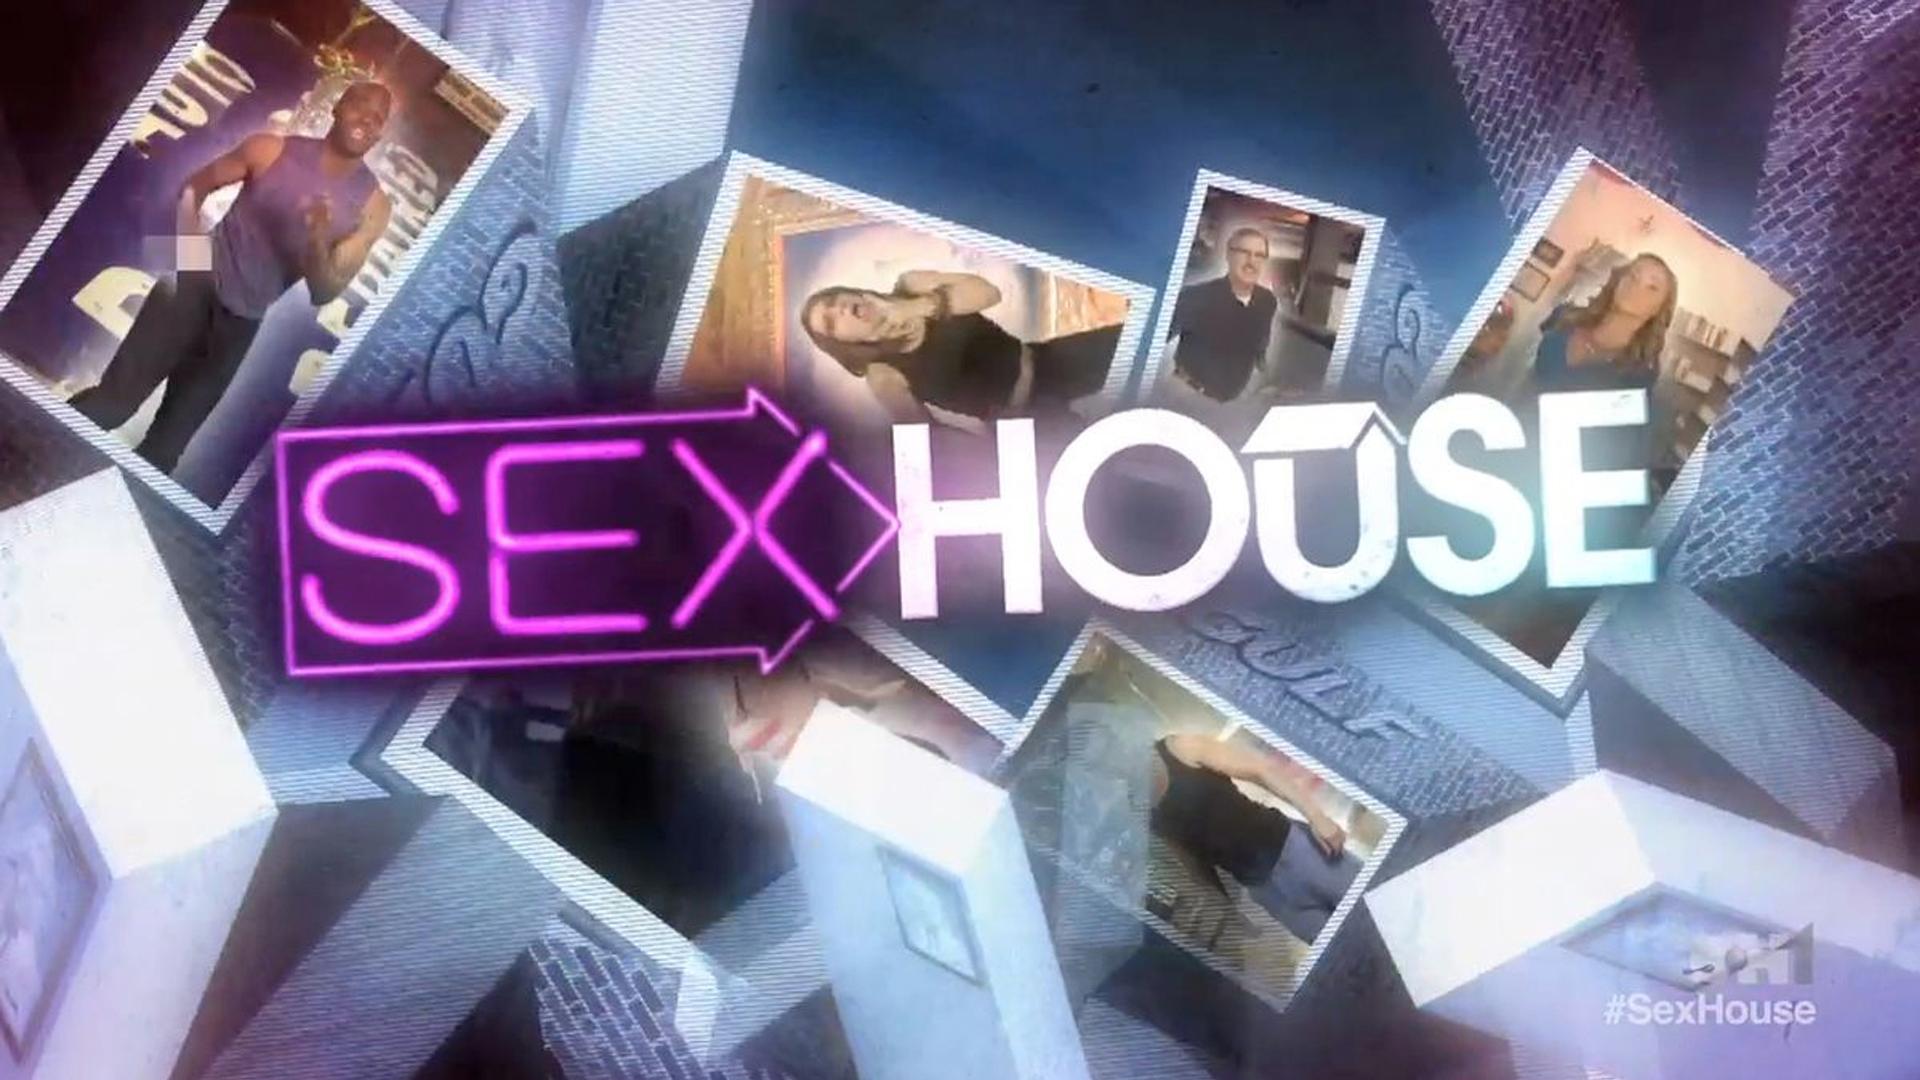 TheOnion_SexHouse_1920x1080.jpg